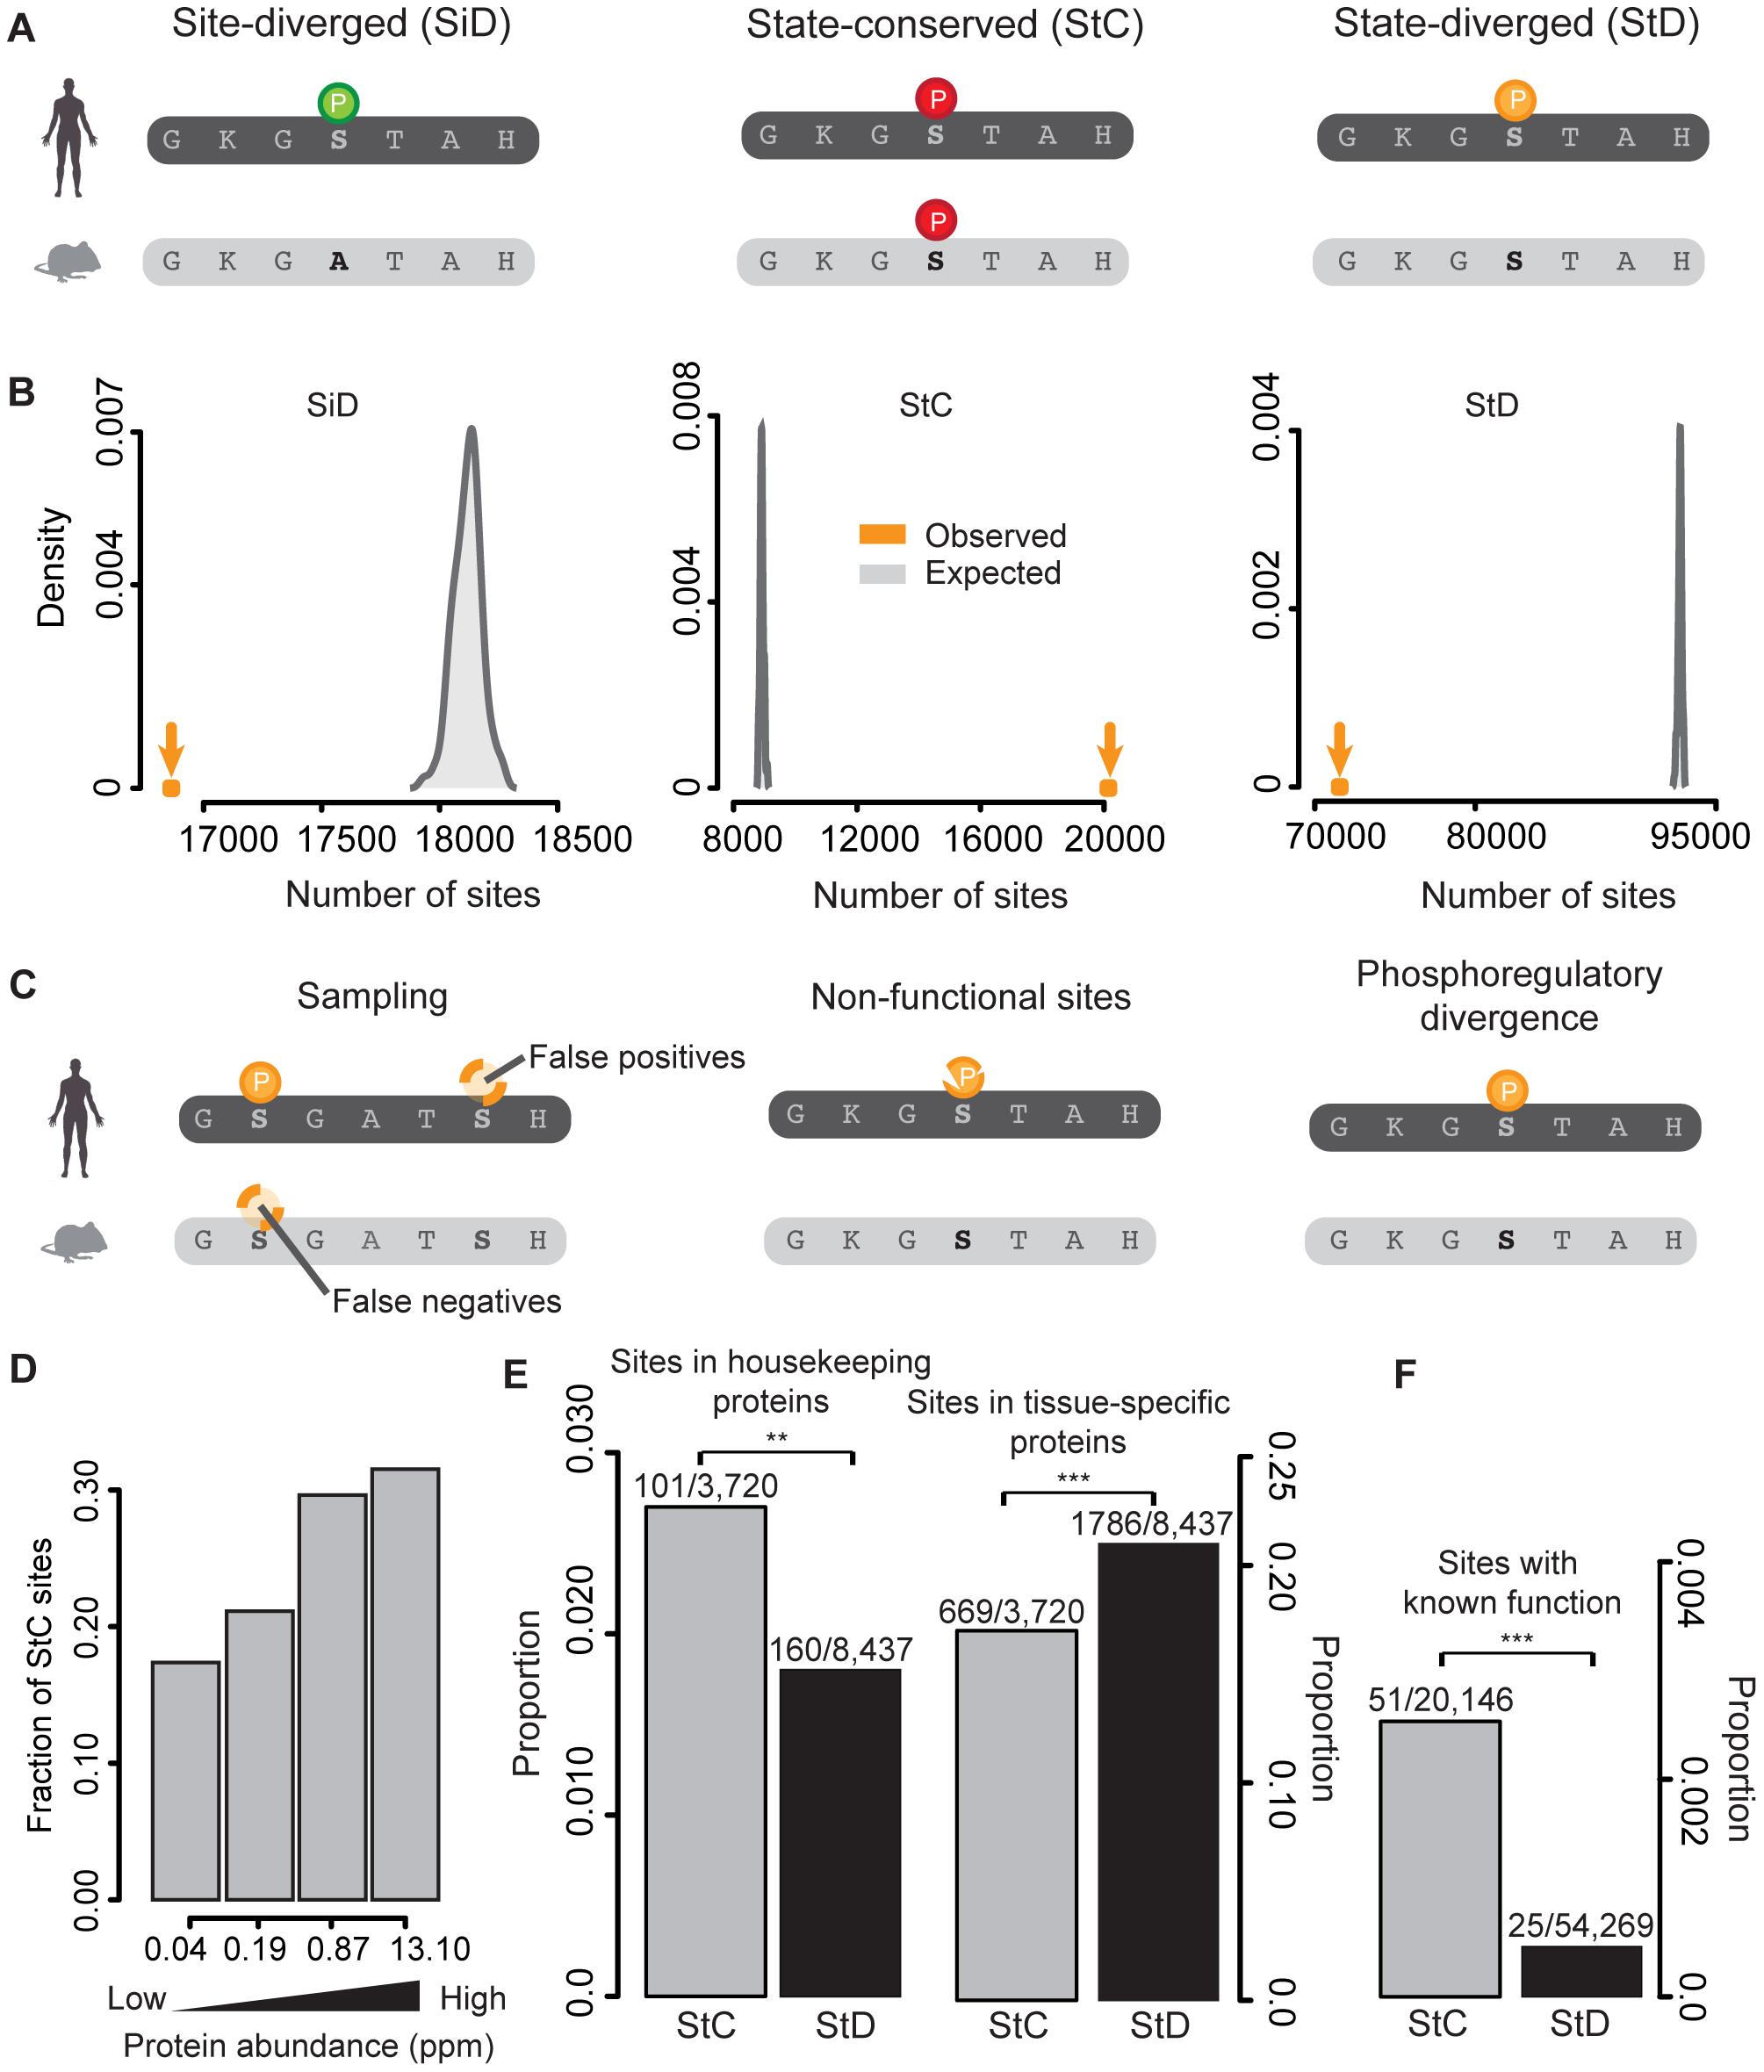 Purifying selection is acting on mammalian phosphorylation sites and their phosphorylation status.